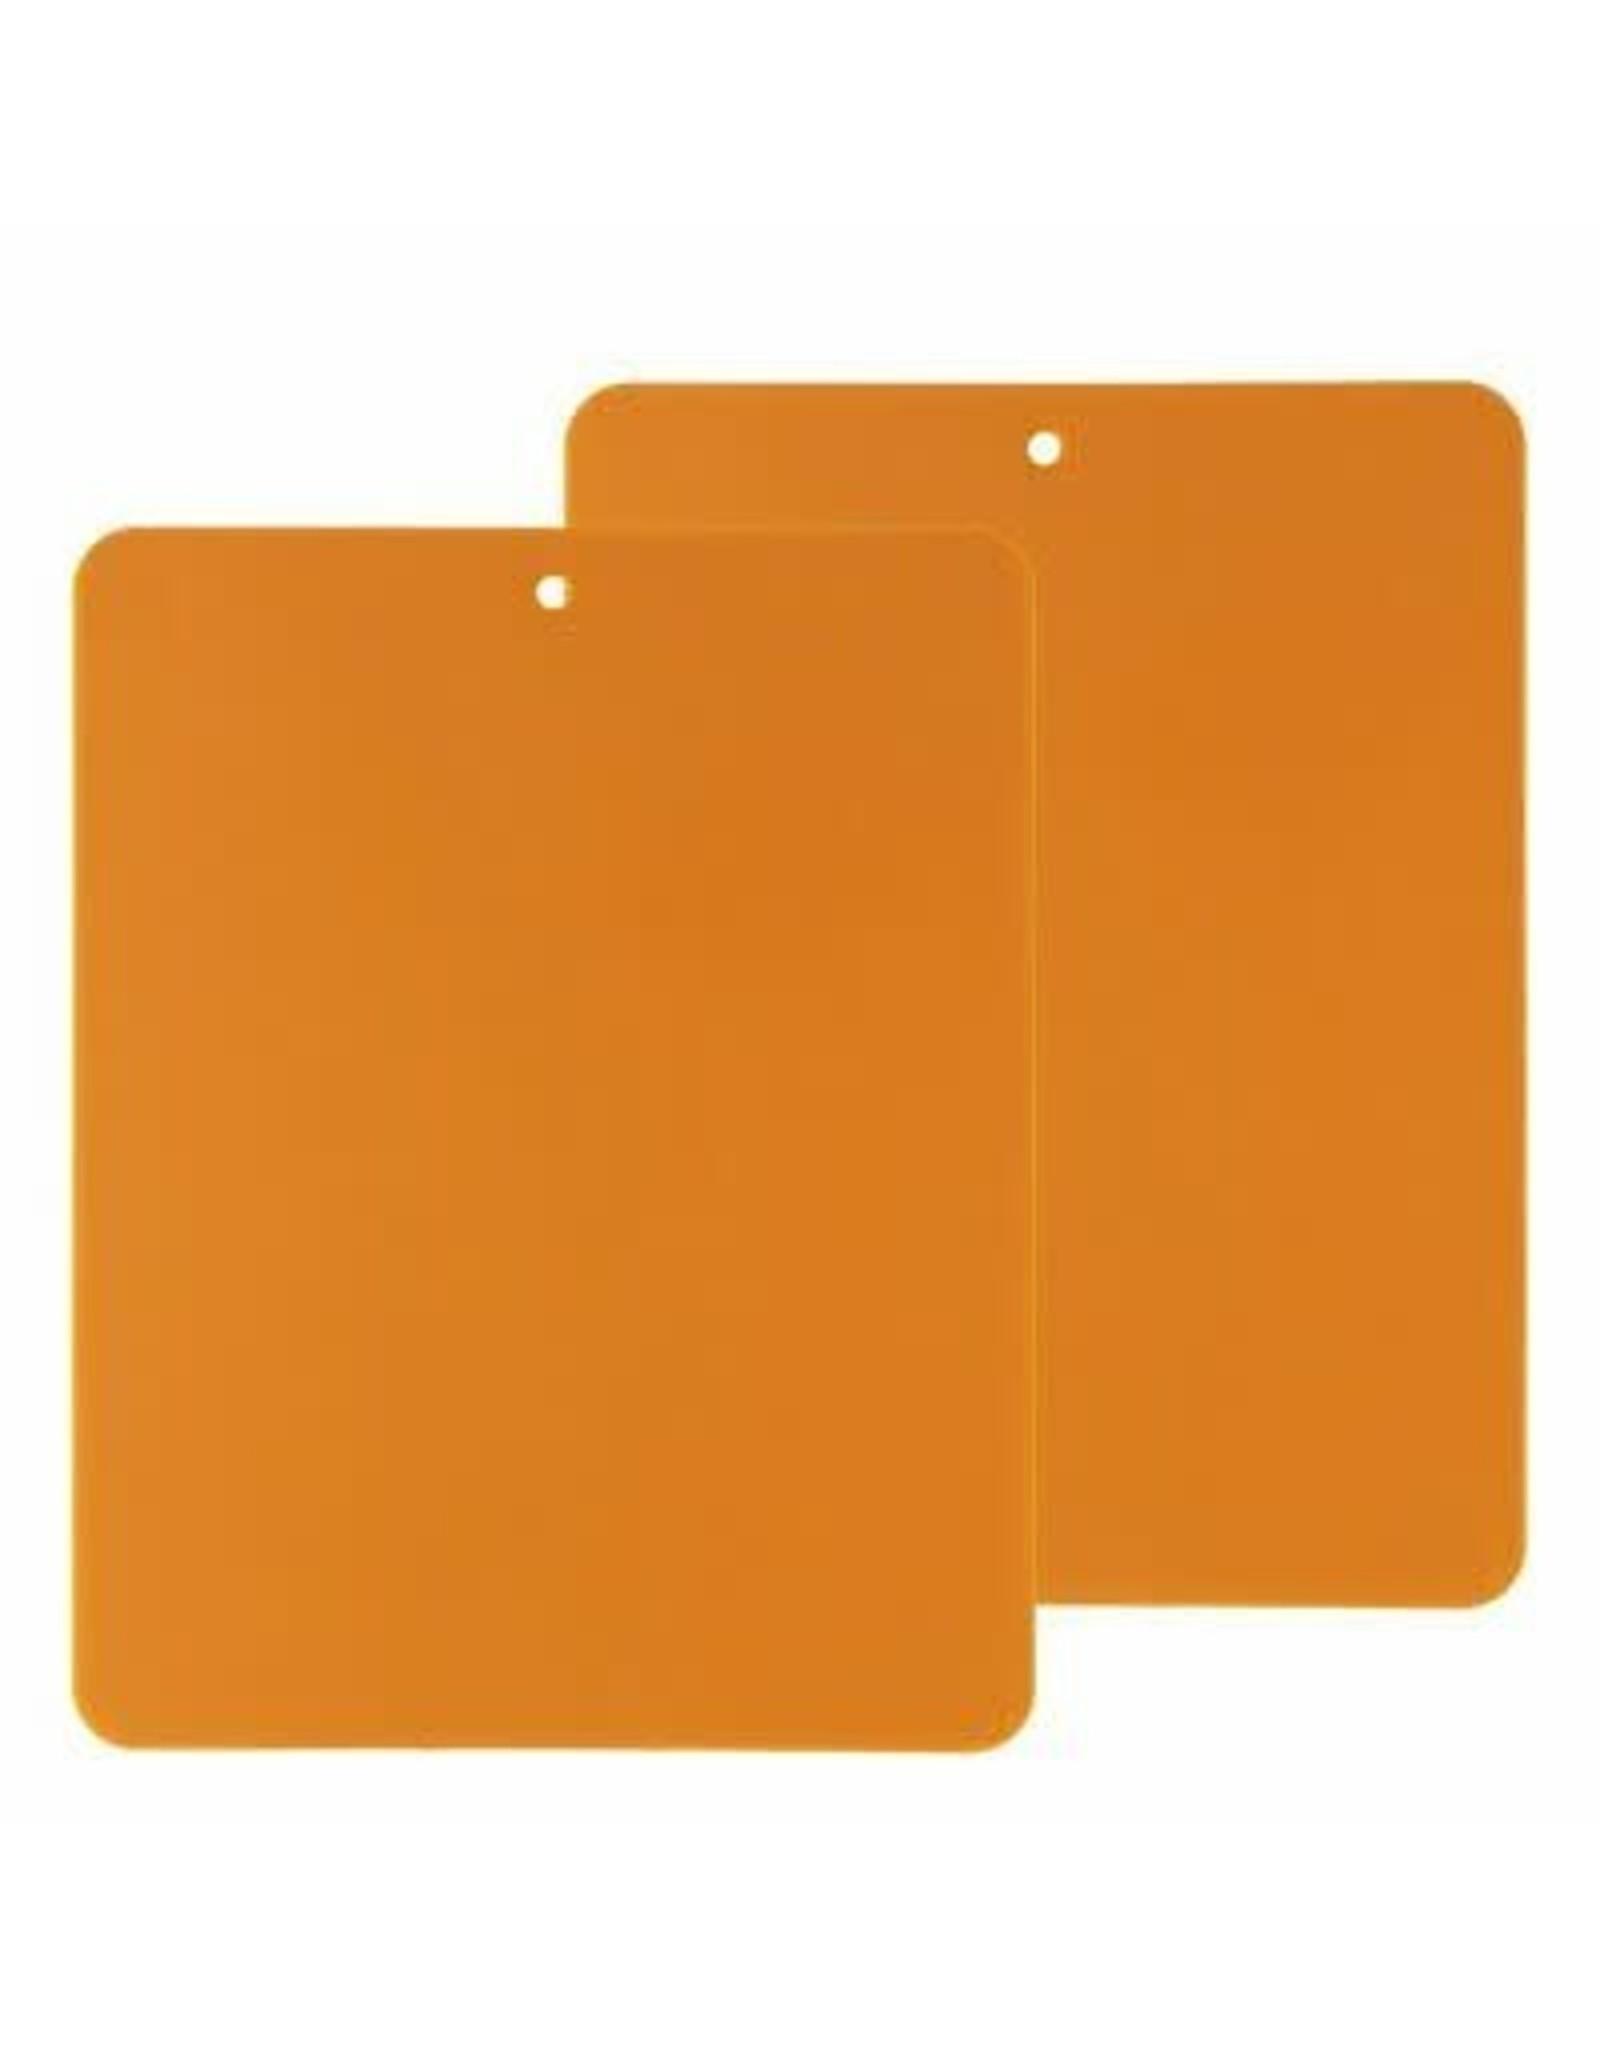 BENDY Flex Board PK/2 - Orange